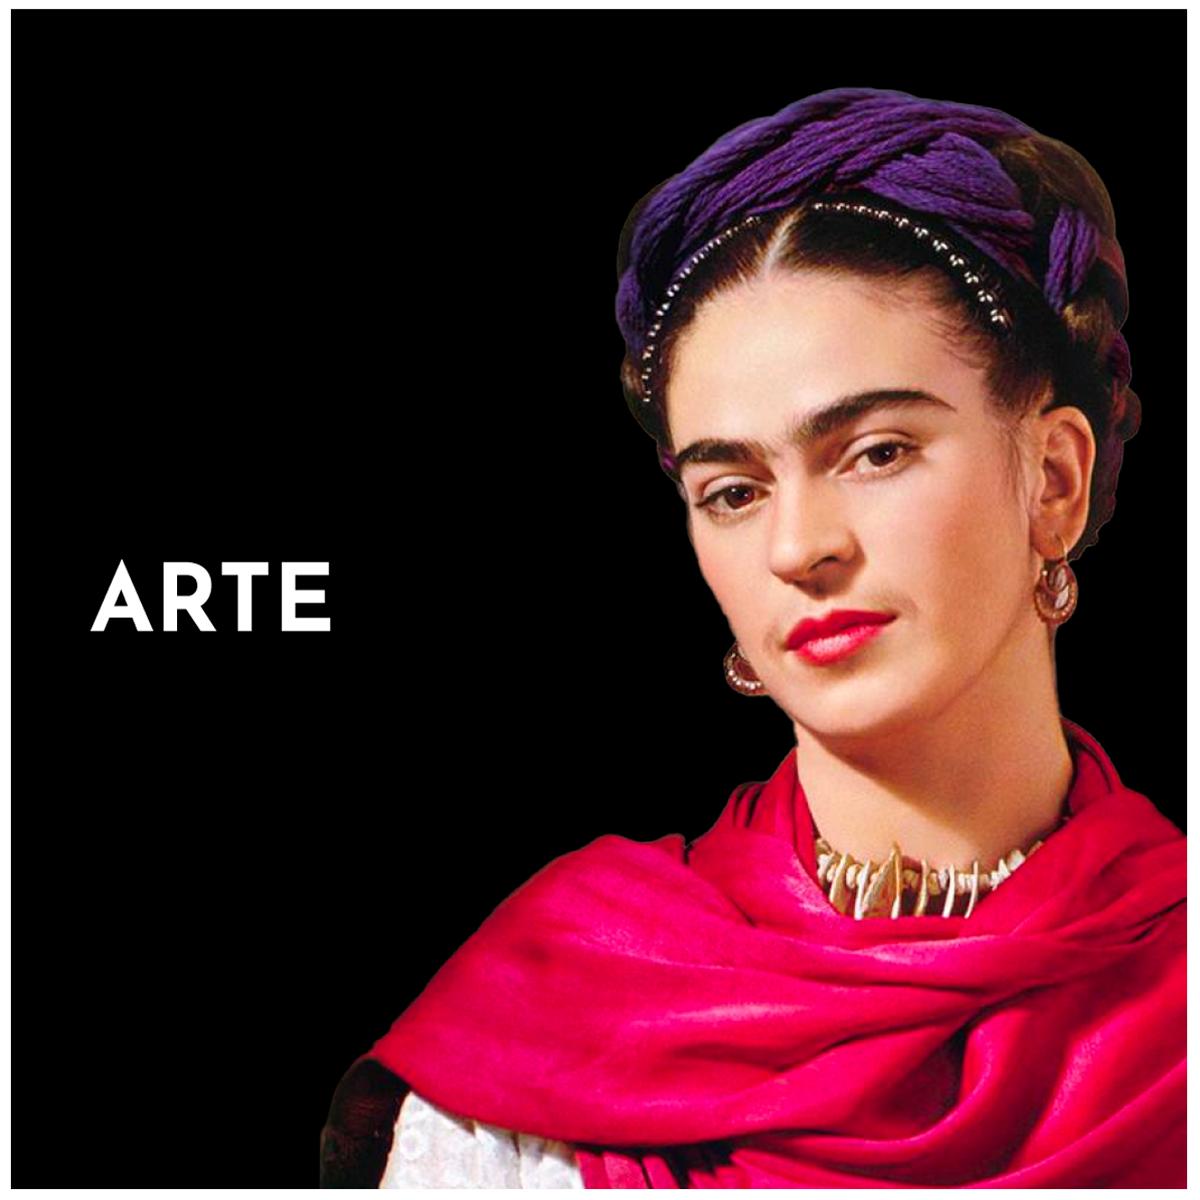 ilustre, cursos, nacion de la cultura, cultura en español, cursos online, cultura, apredizaje online, Arte, literatura, cine, historia, Musica